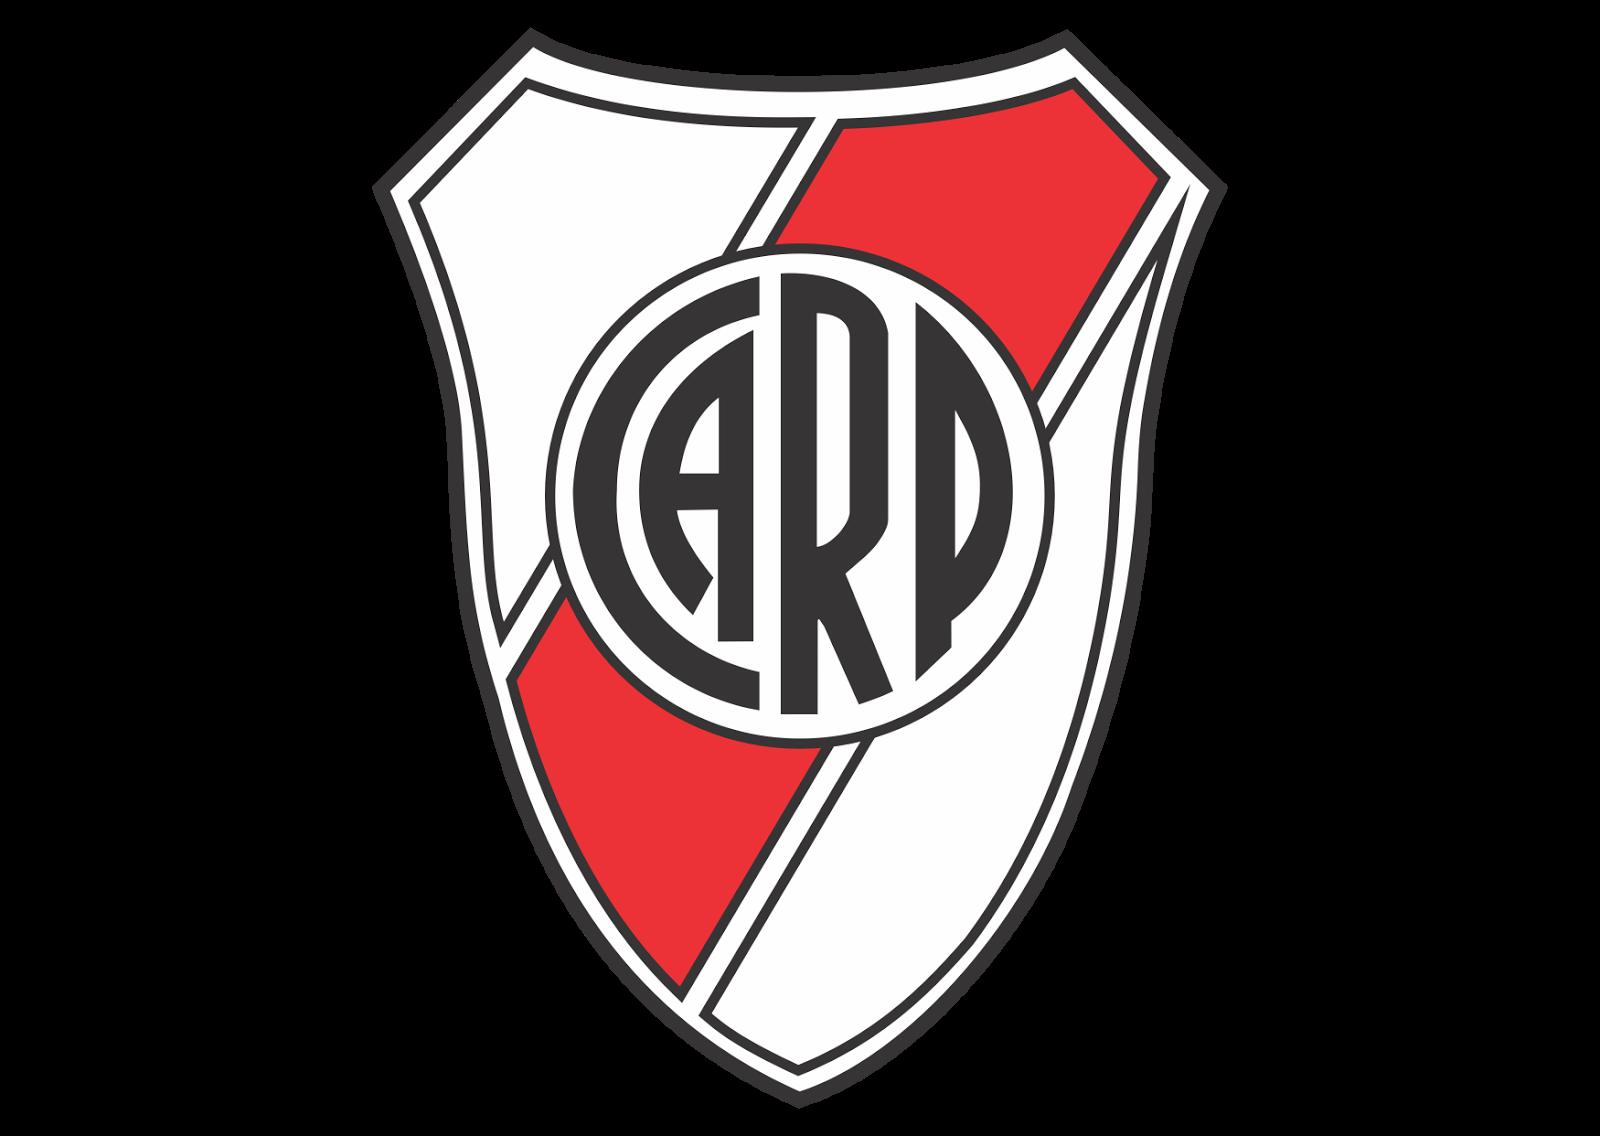 River Plate: River Plate Escudo Logo Vector